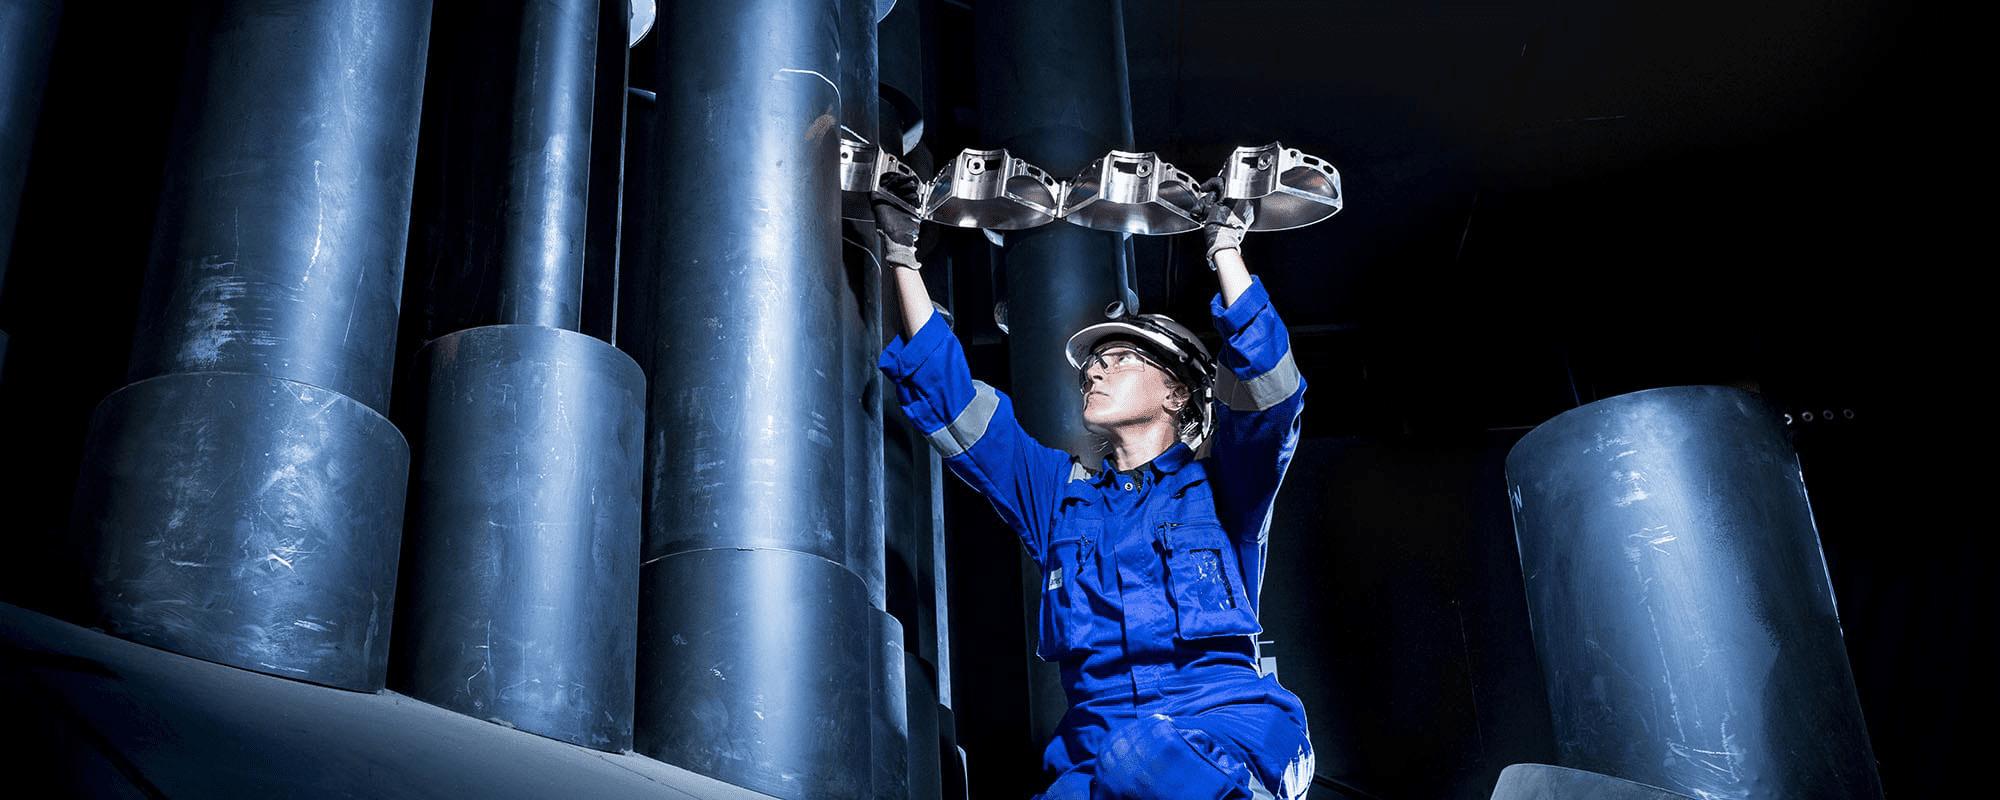 Nuclear & Industrial photographer